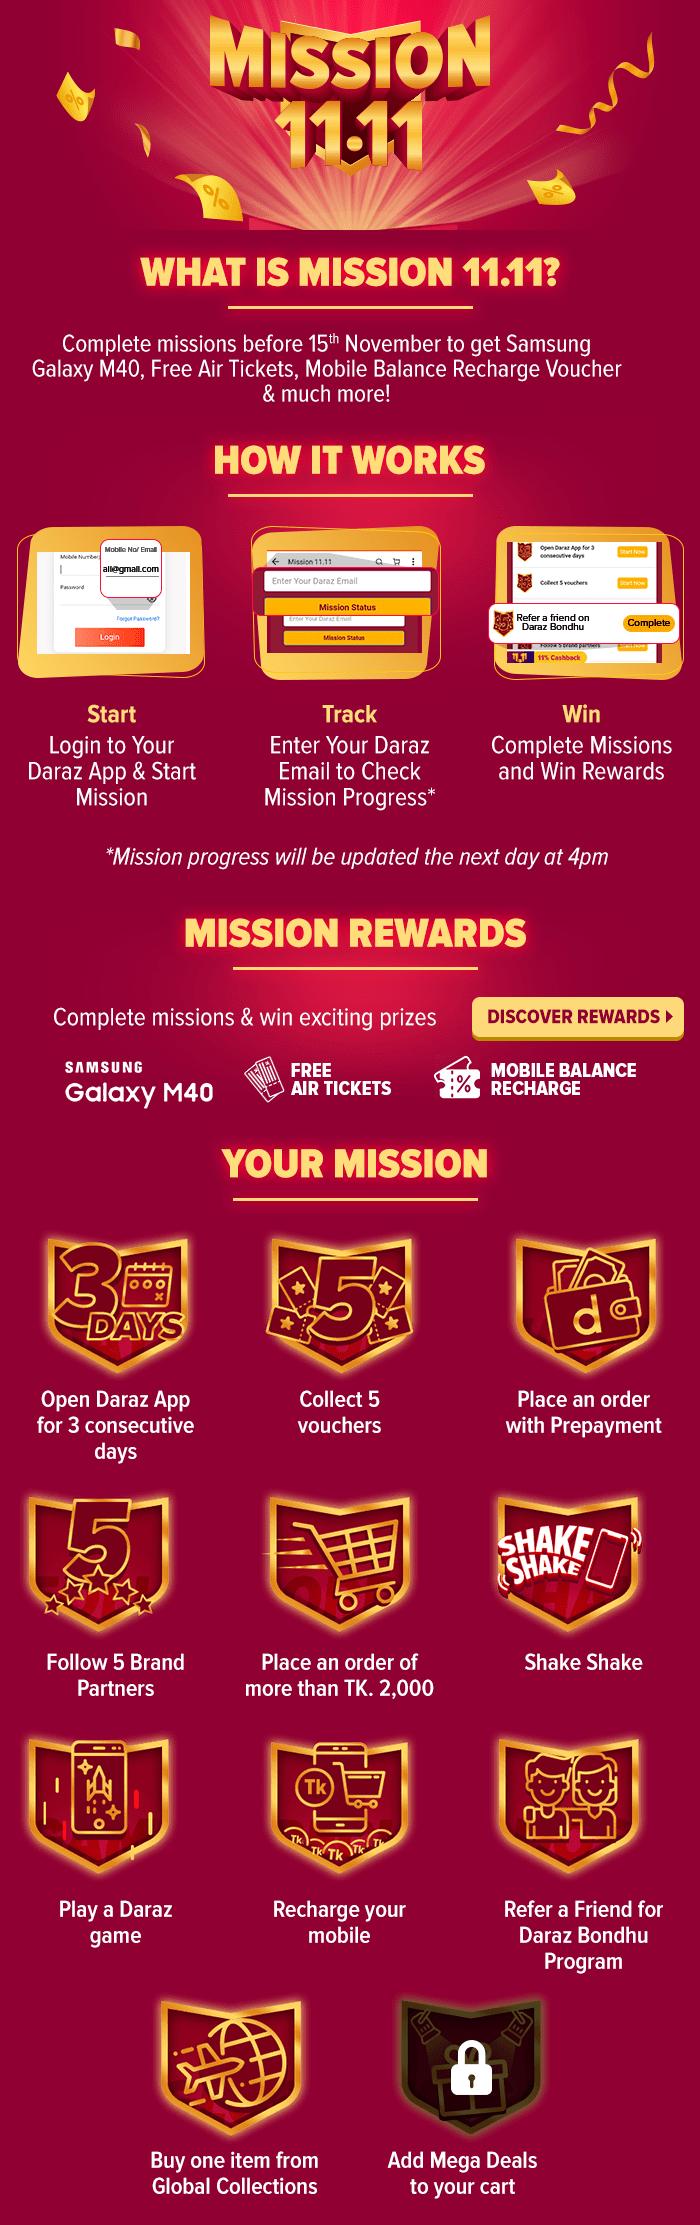 daraz mission 11.11